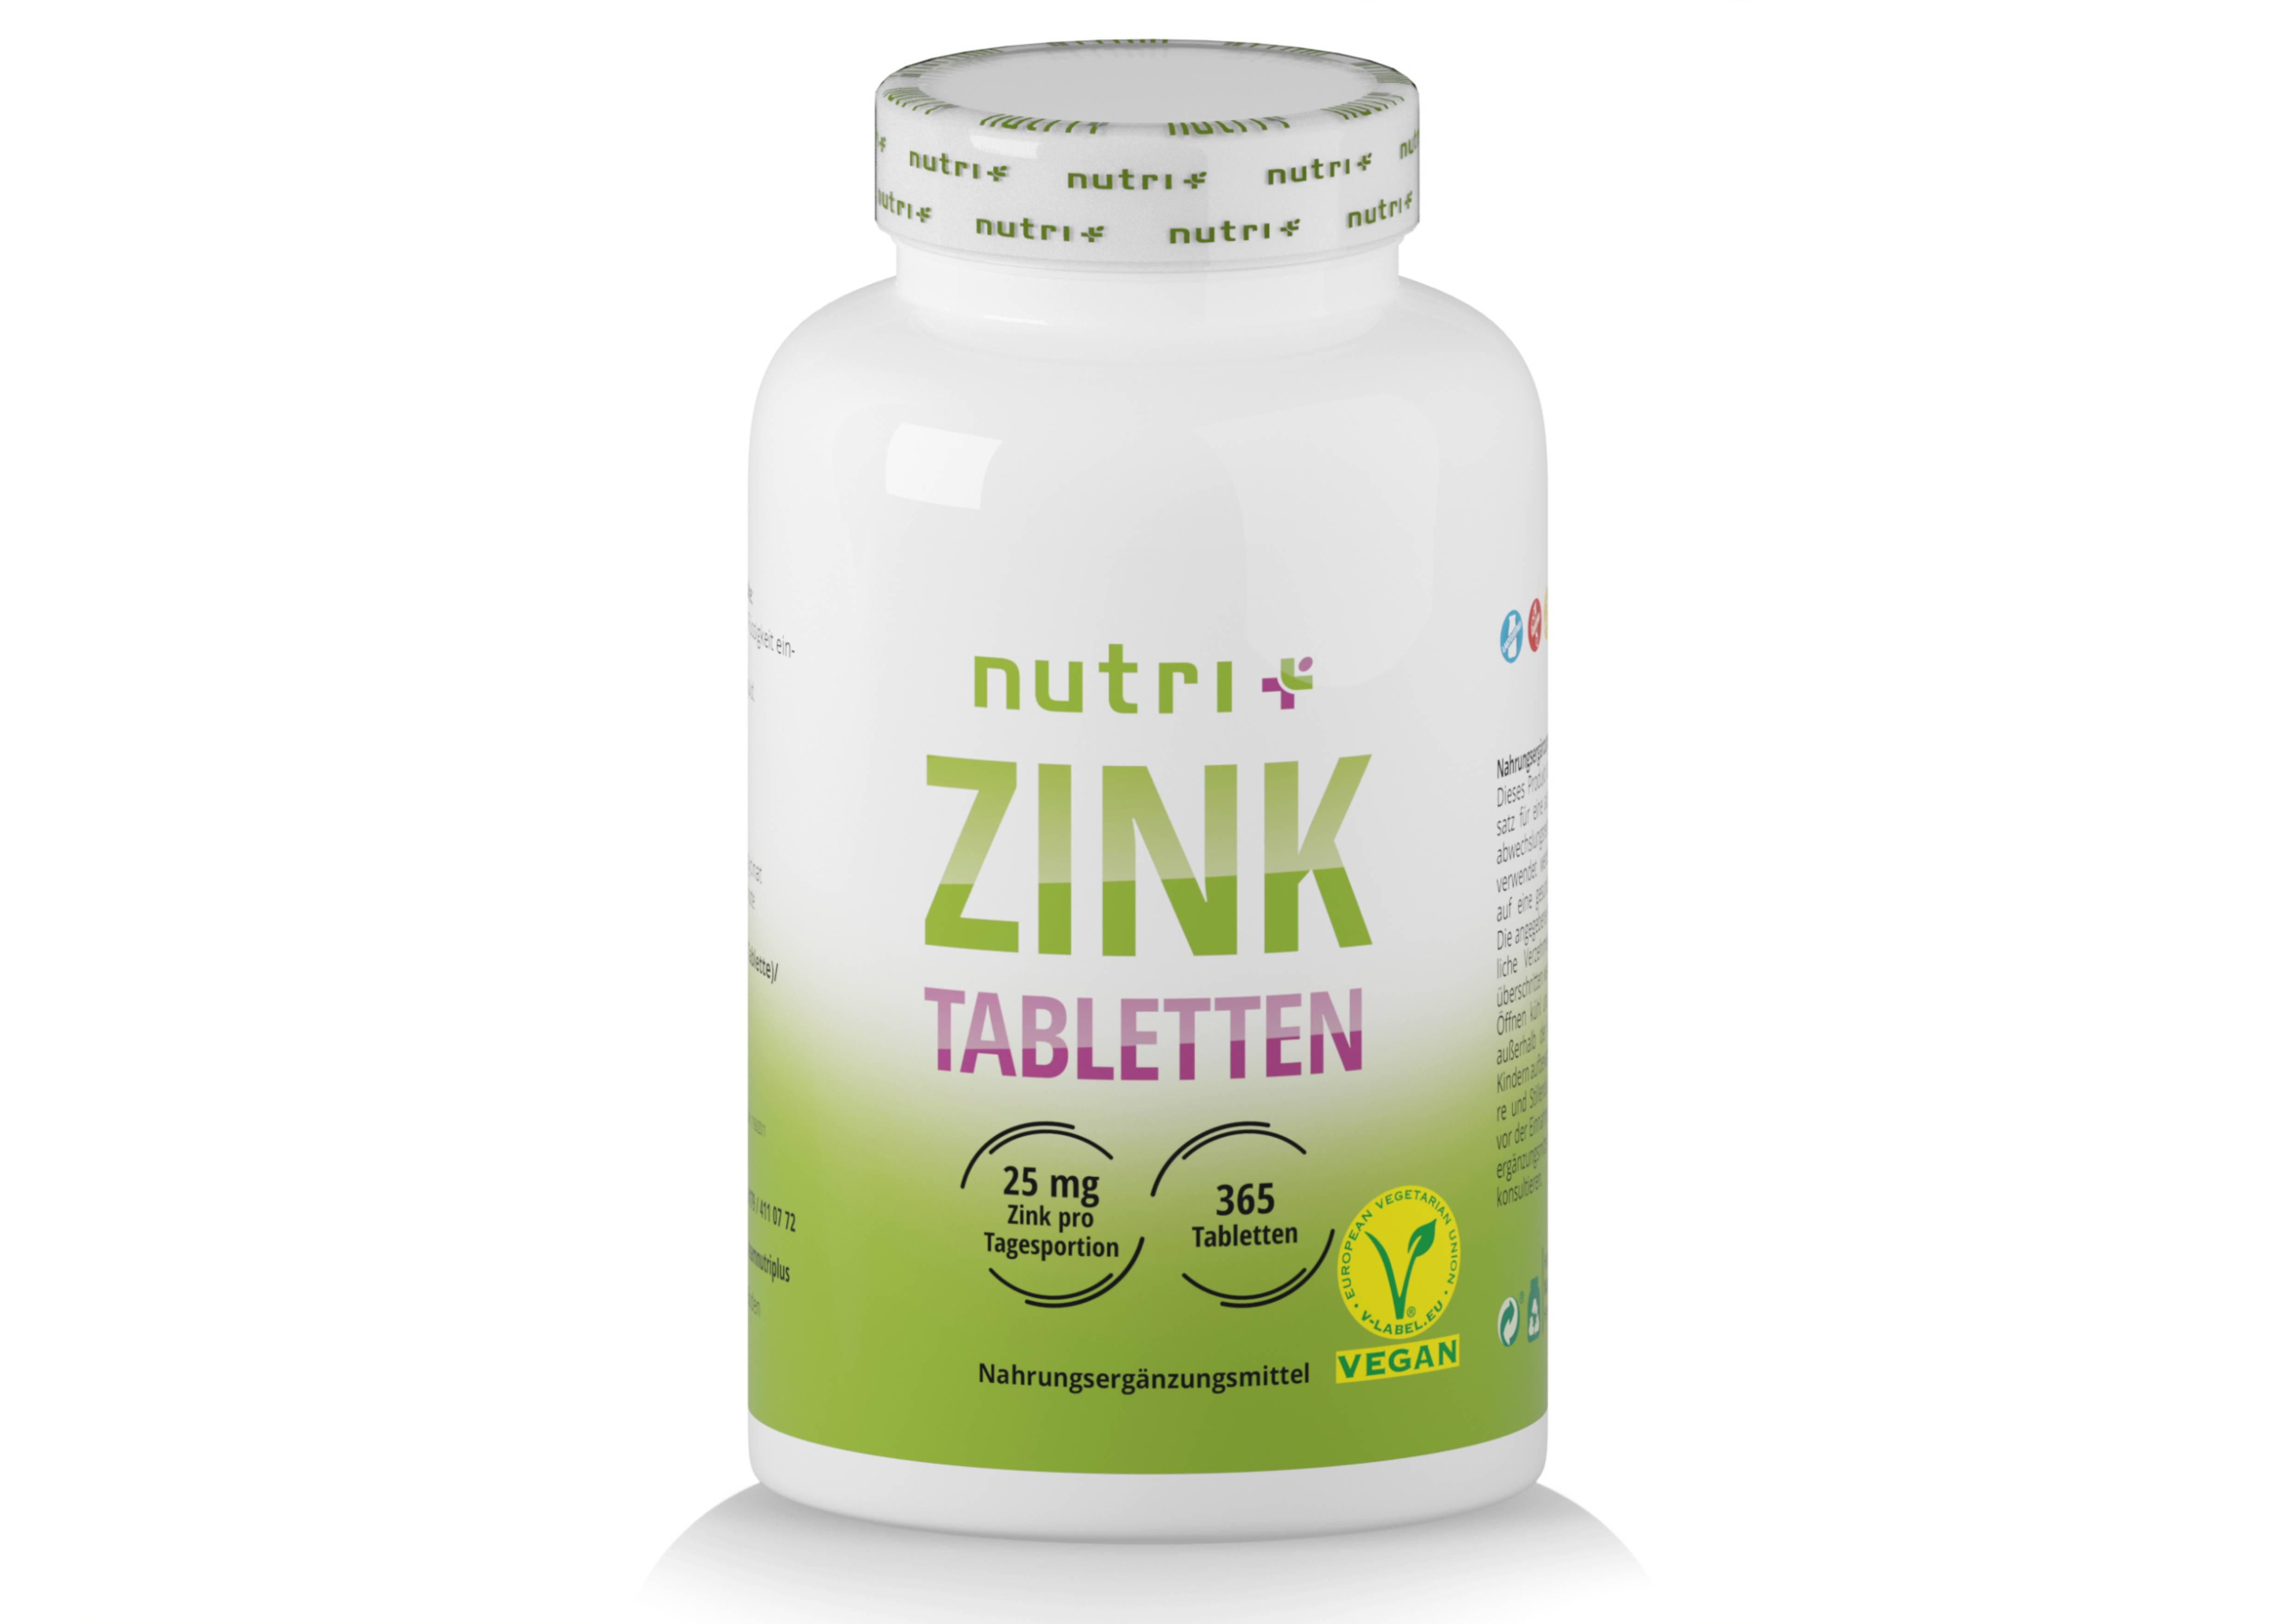 nutri+ Zink Tabletten - 365 hochdosierte Tabletten